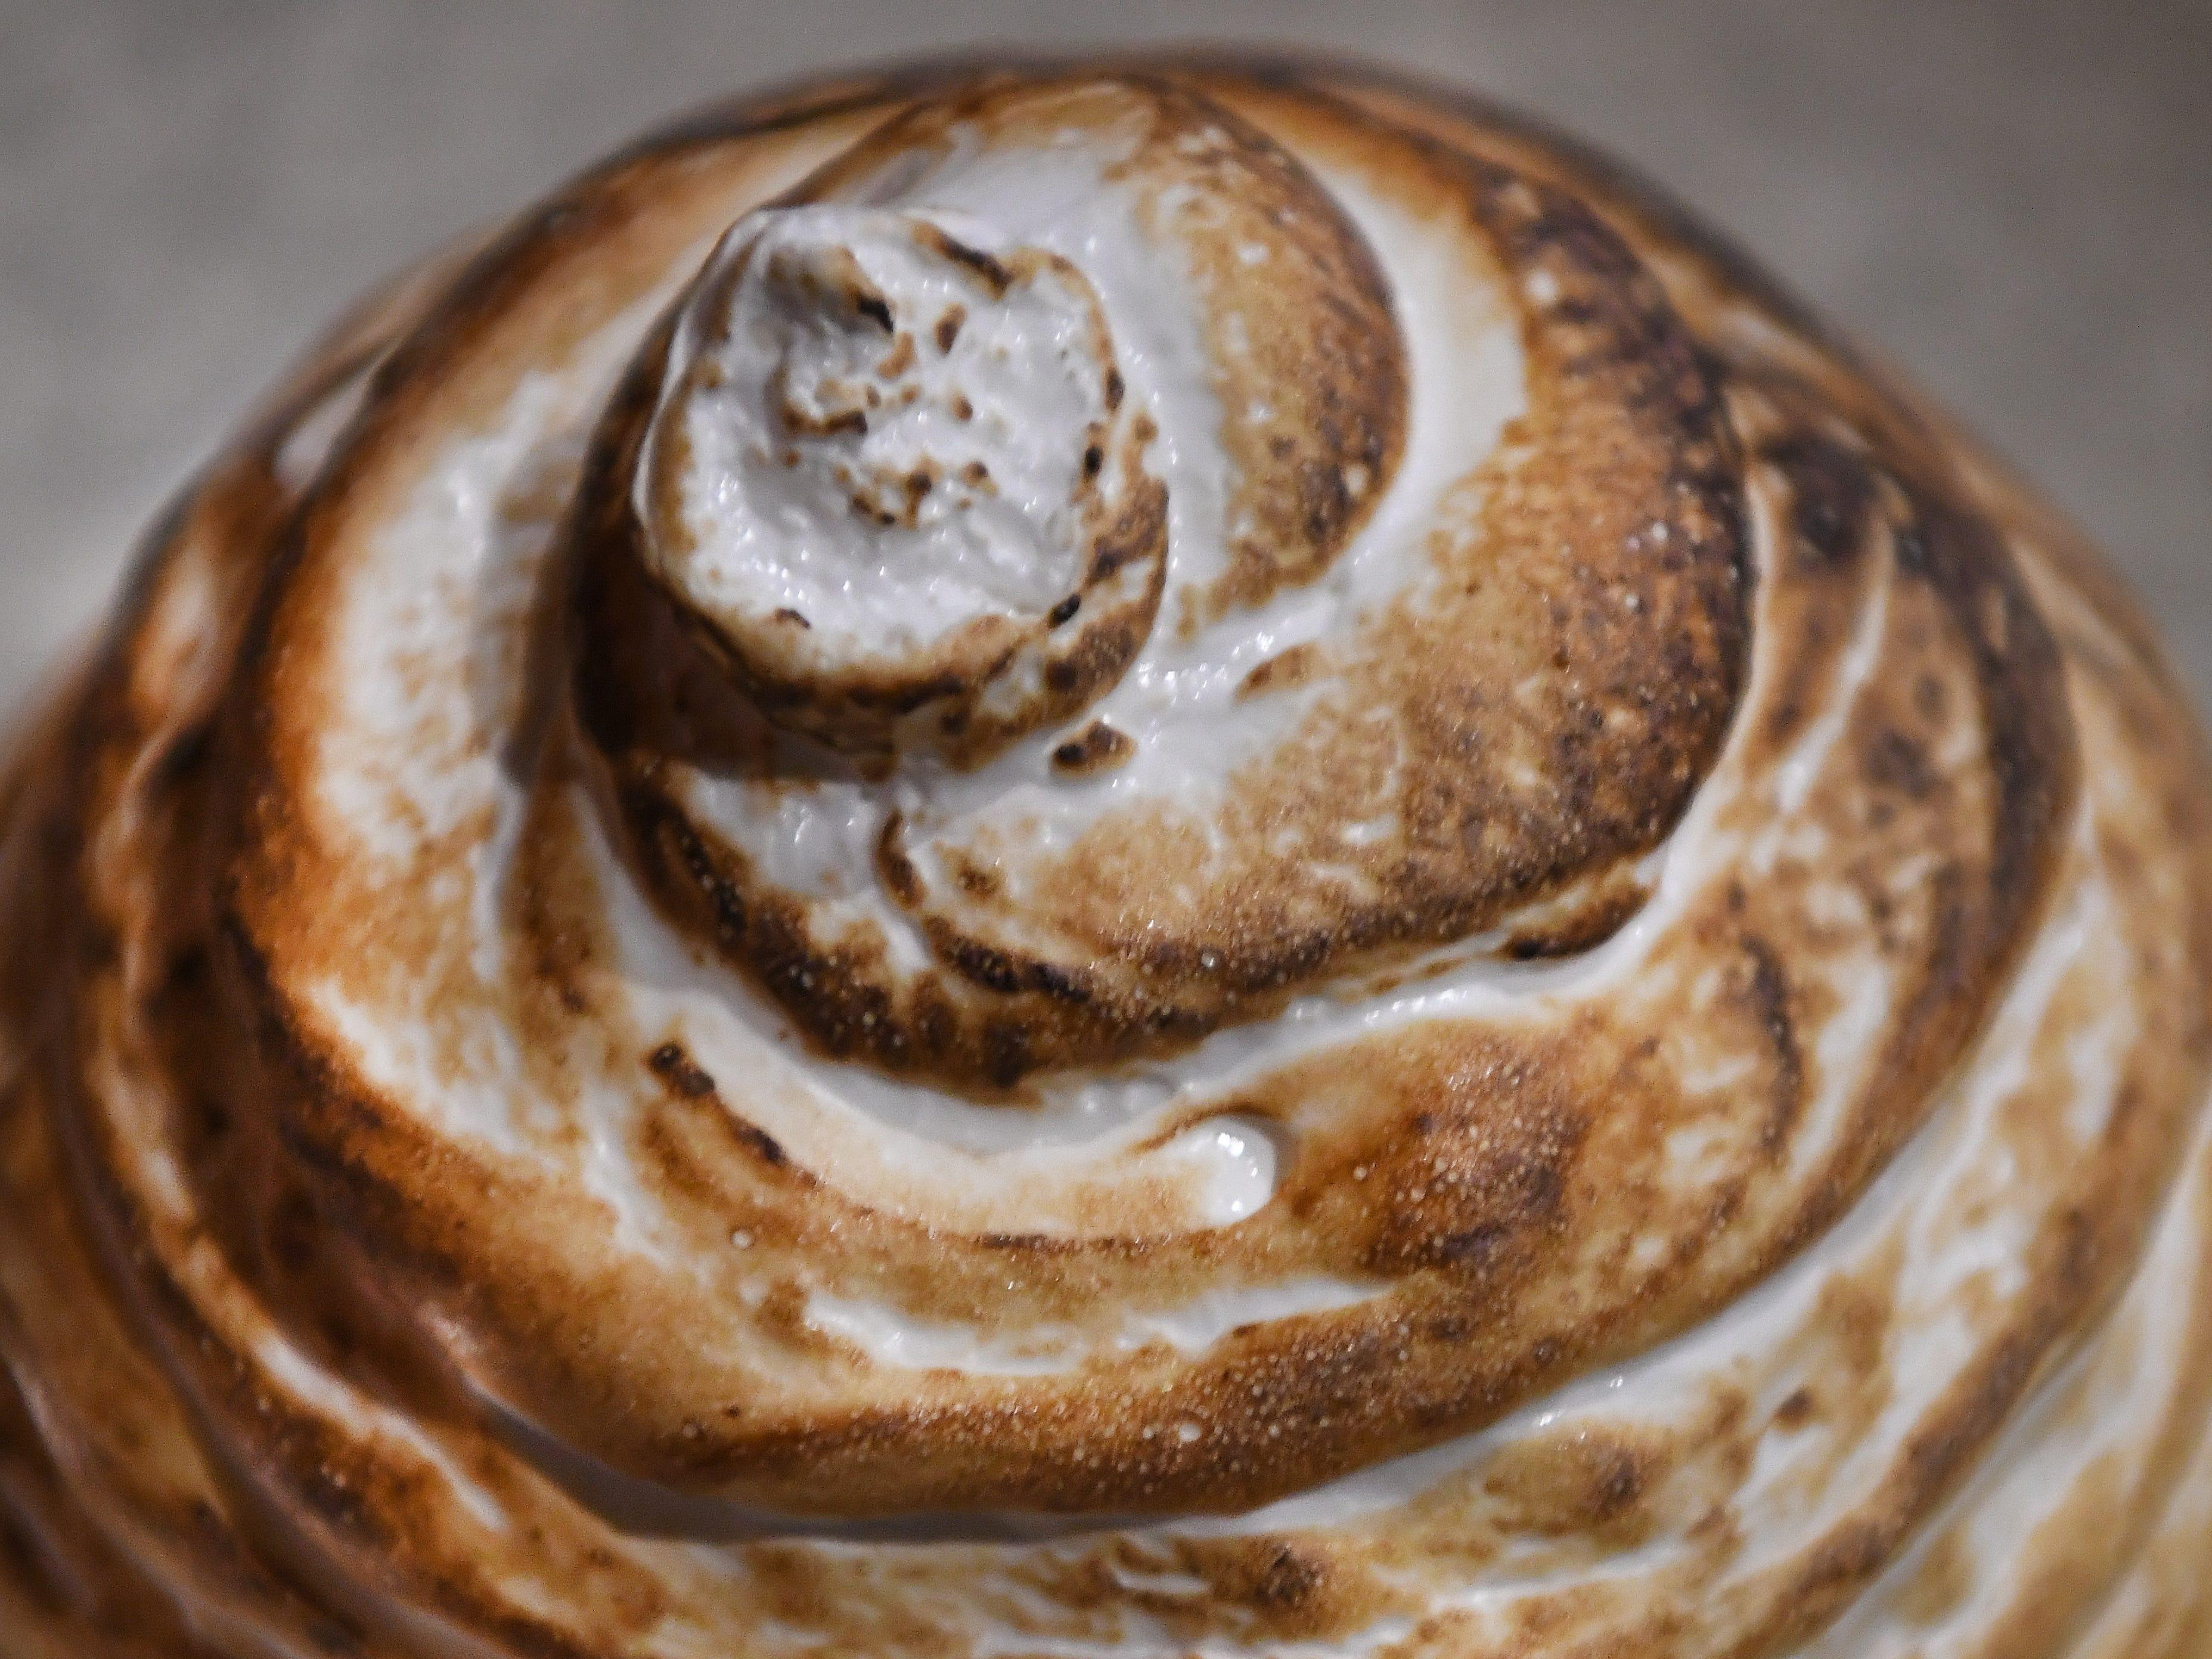 Antihero's version of baked Alaska.